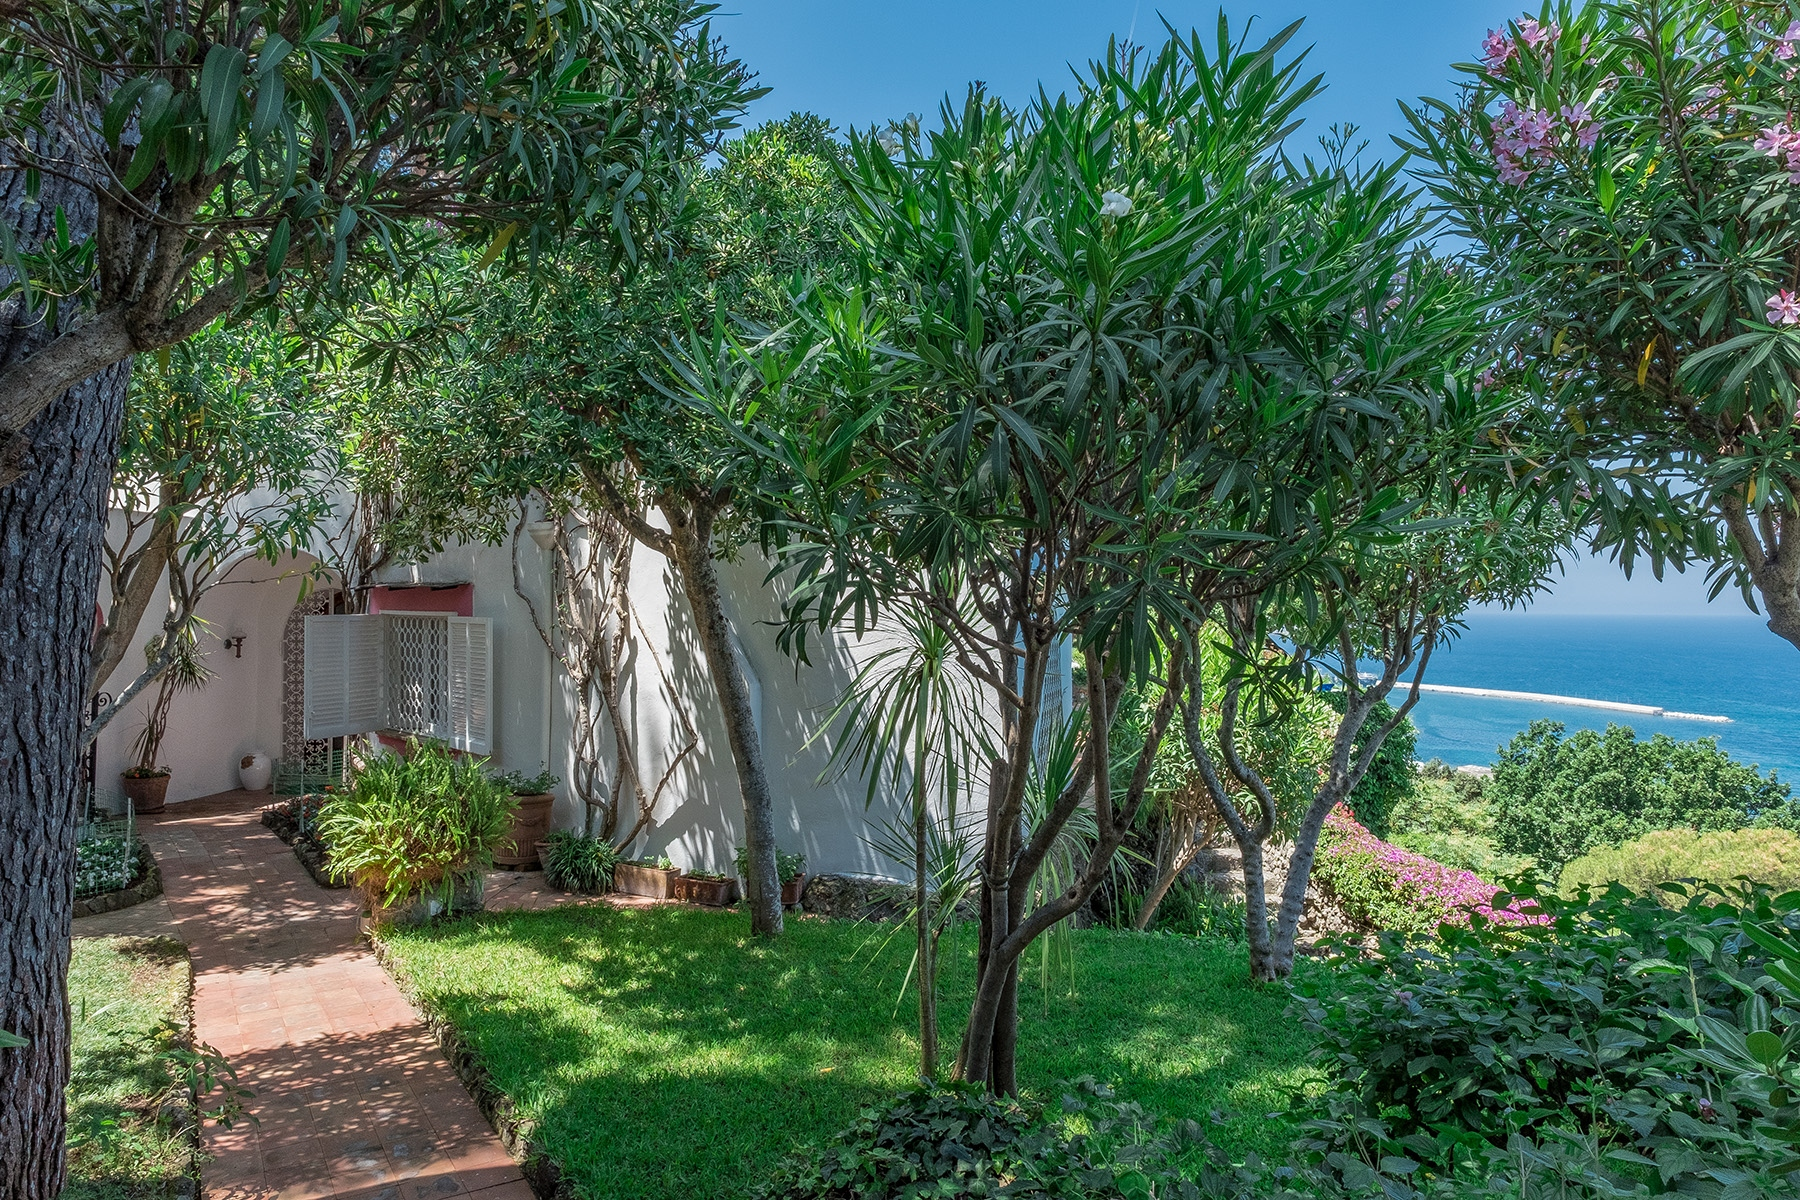 Villa in Vendita a Ischia: 5 locali, 206 mq - Foto 21